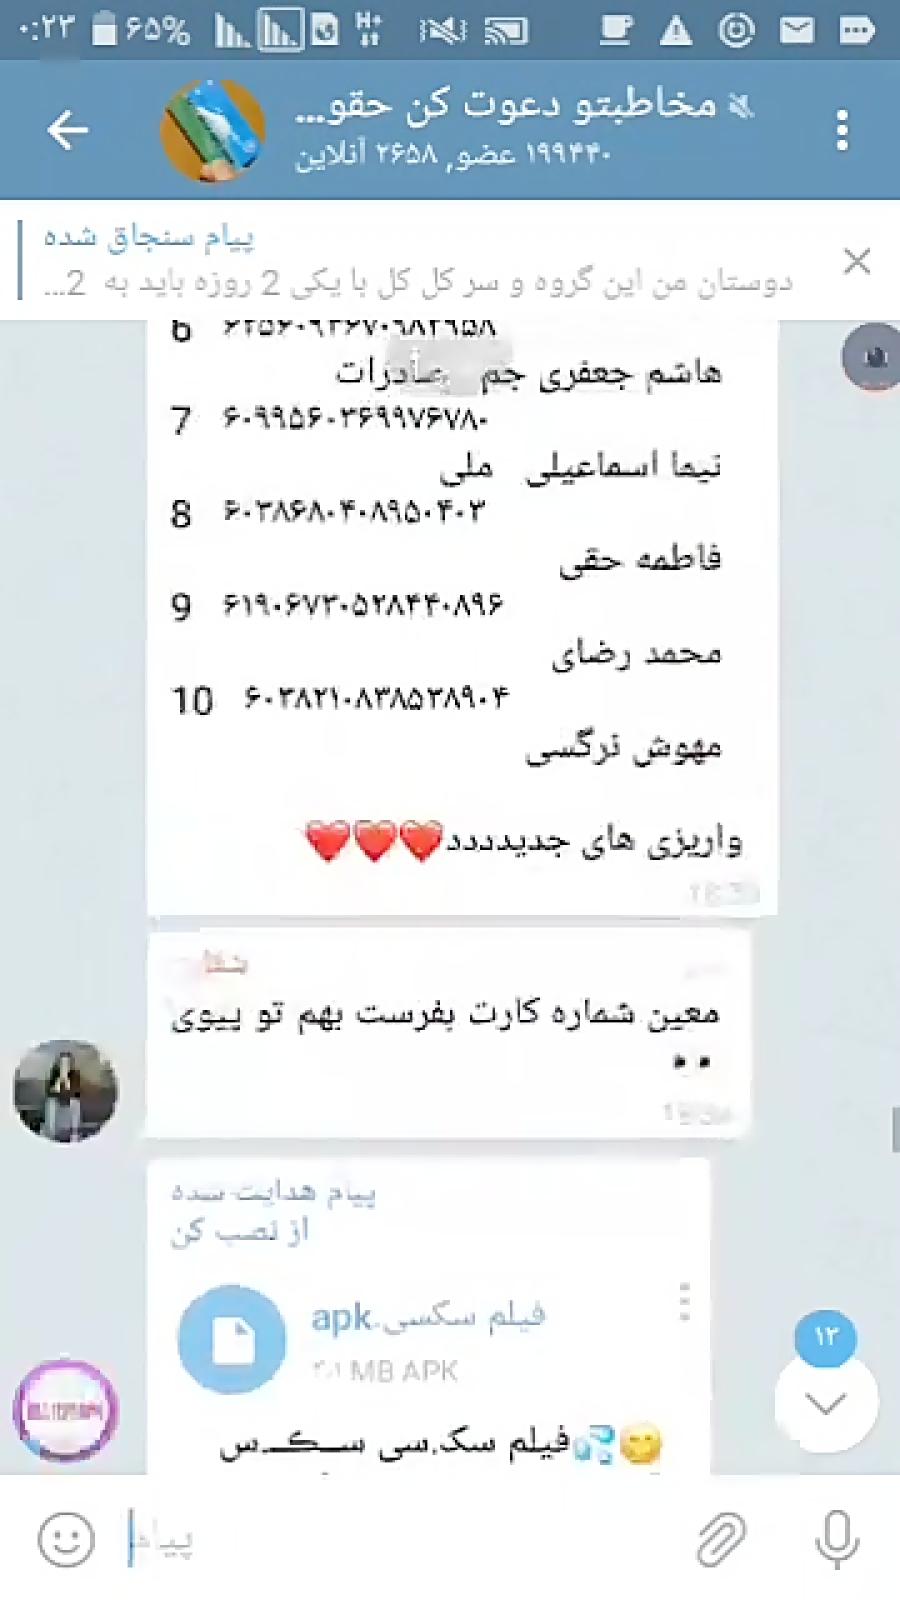 8دورغ ها کانال. تلگرام